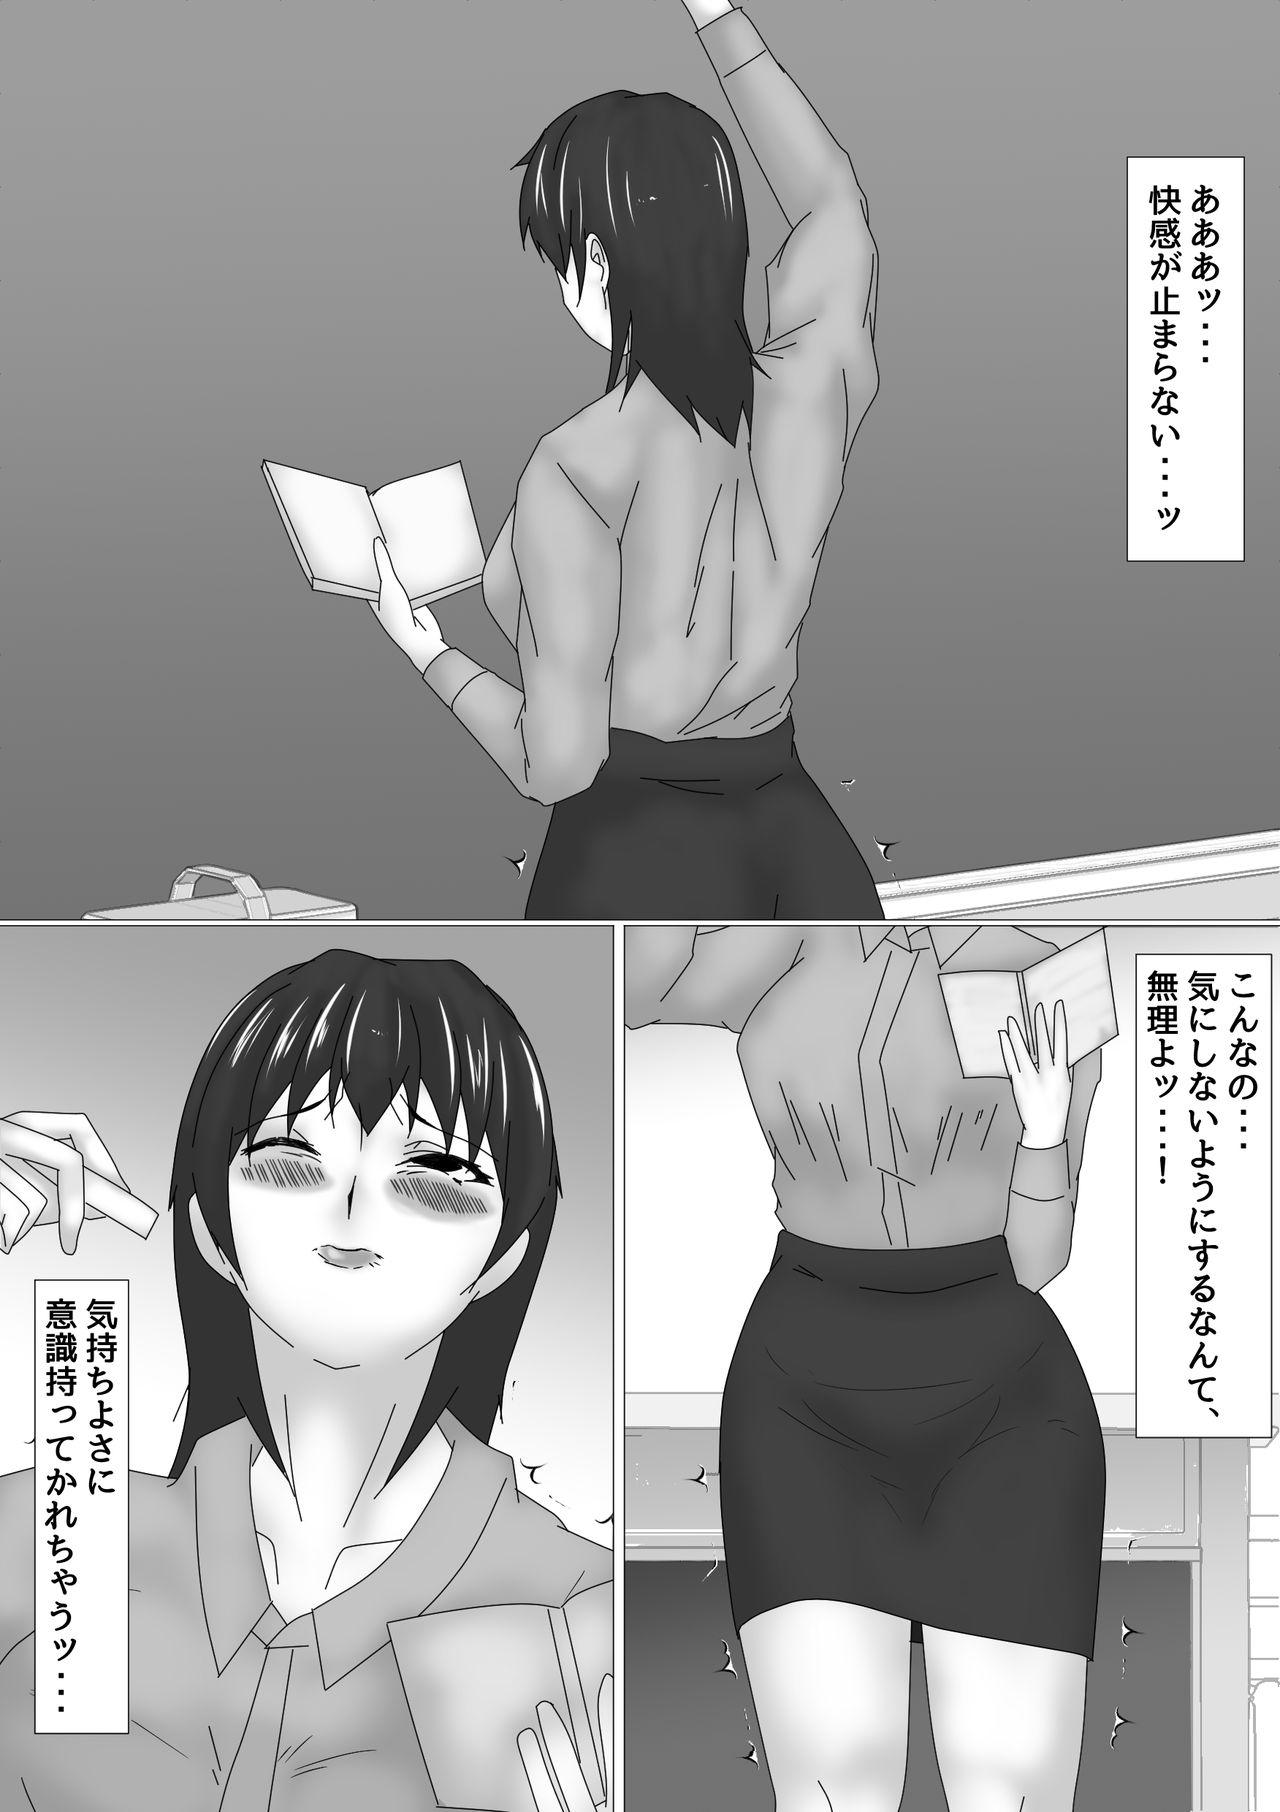 Jokyoushi Shinozaki Rin no Choukyou Kiroku Dai 3 Zenhan | Female Teacher Rin Shinozaki's Training Record 3 First Half 15